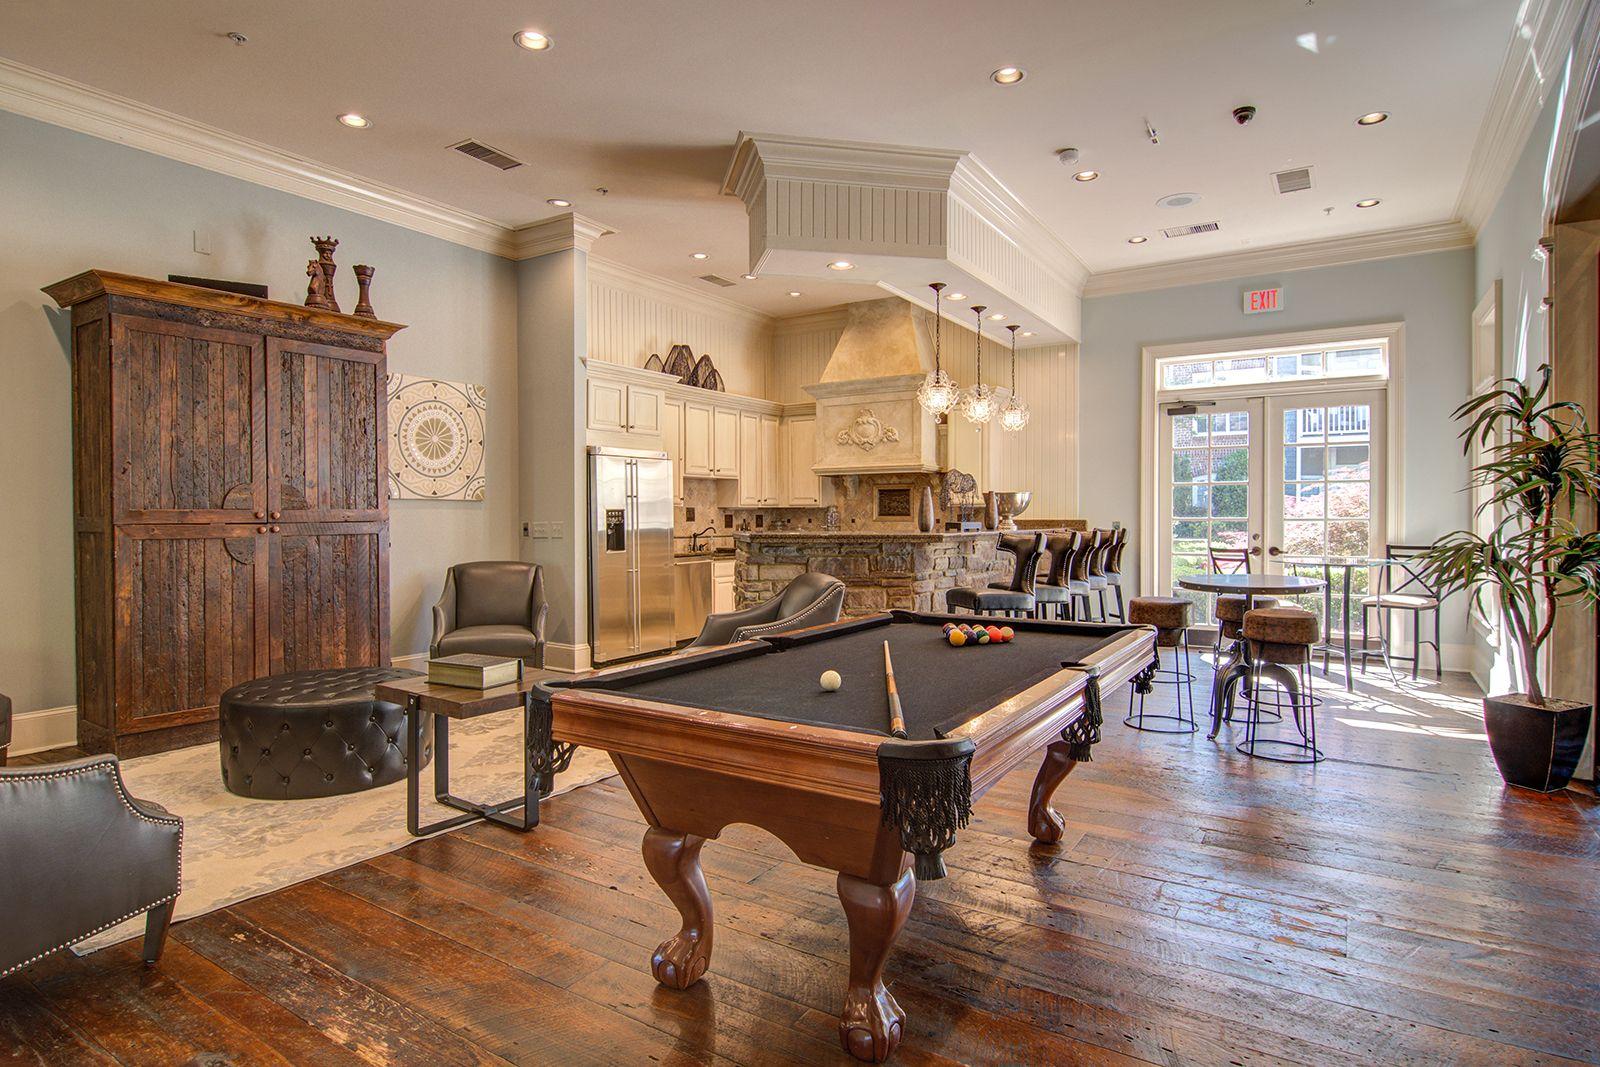 The Artisan Luxury Apartment Homes provides premium